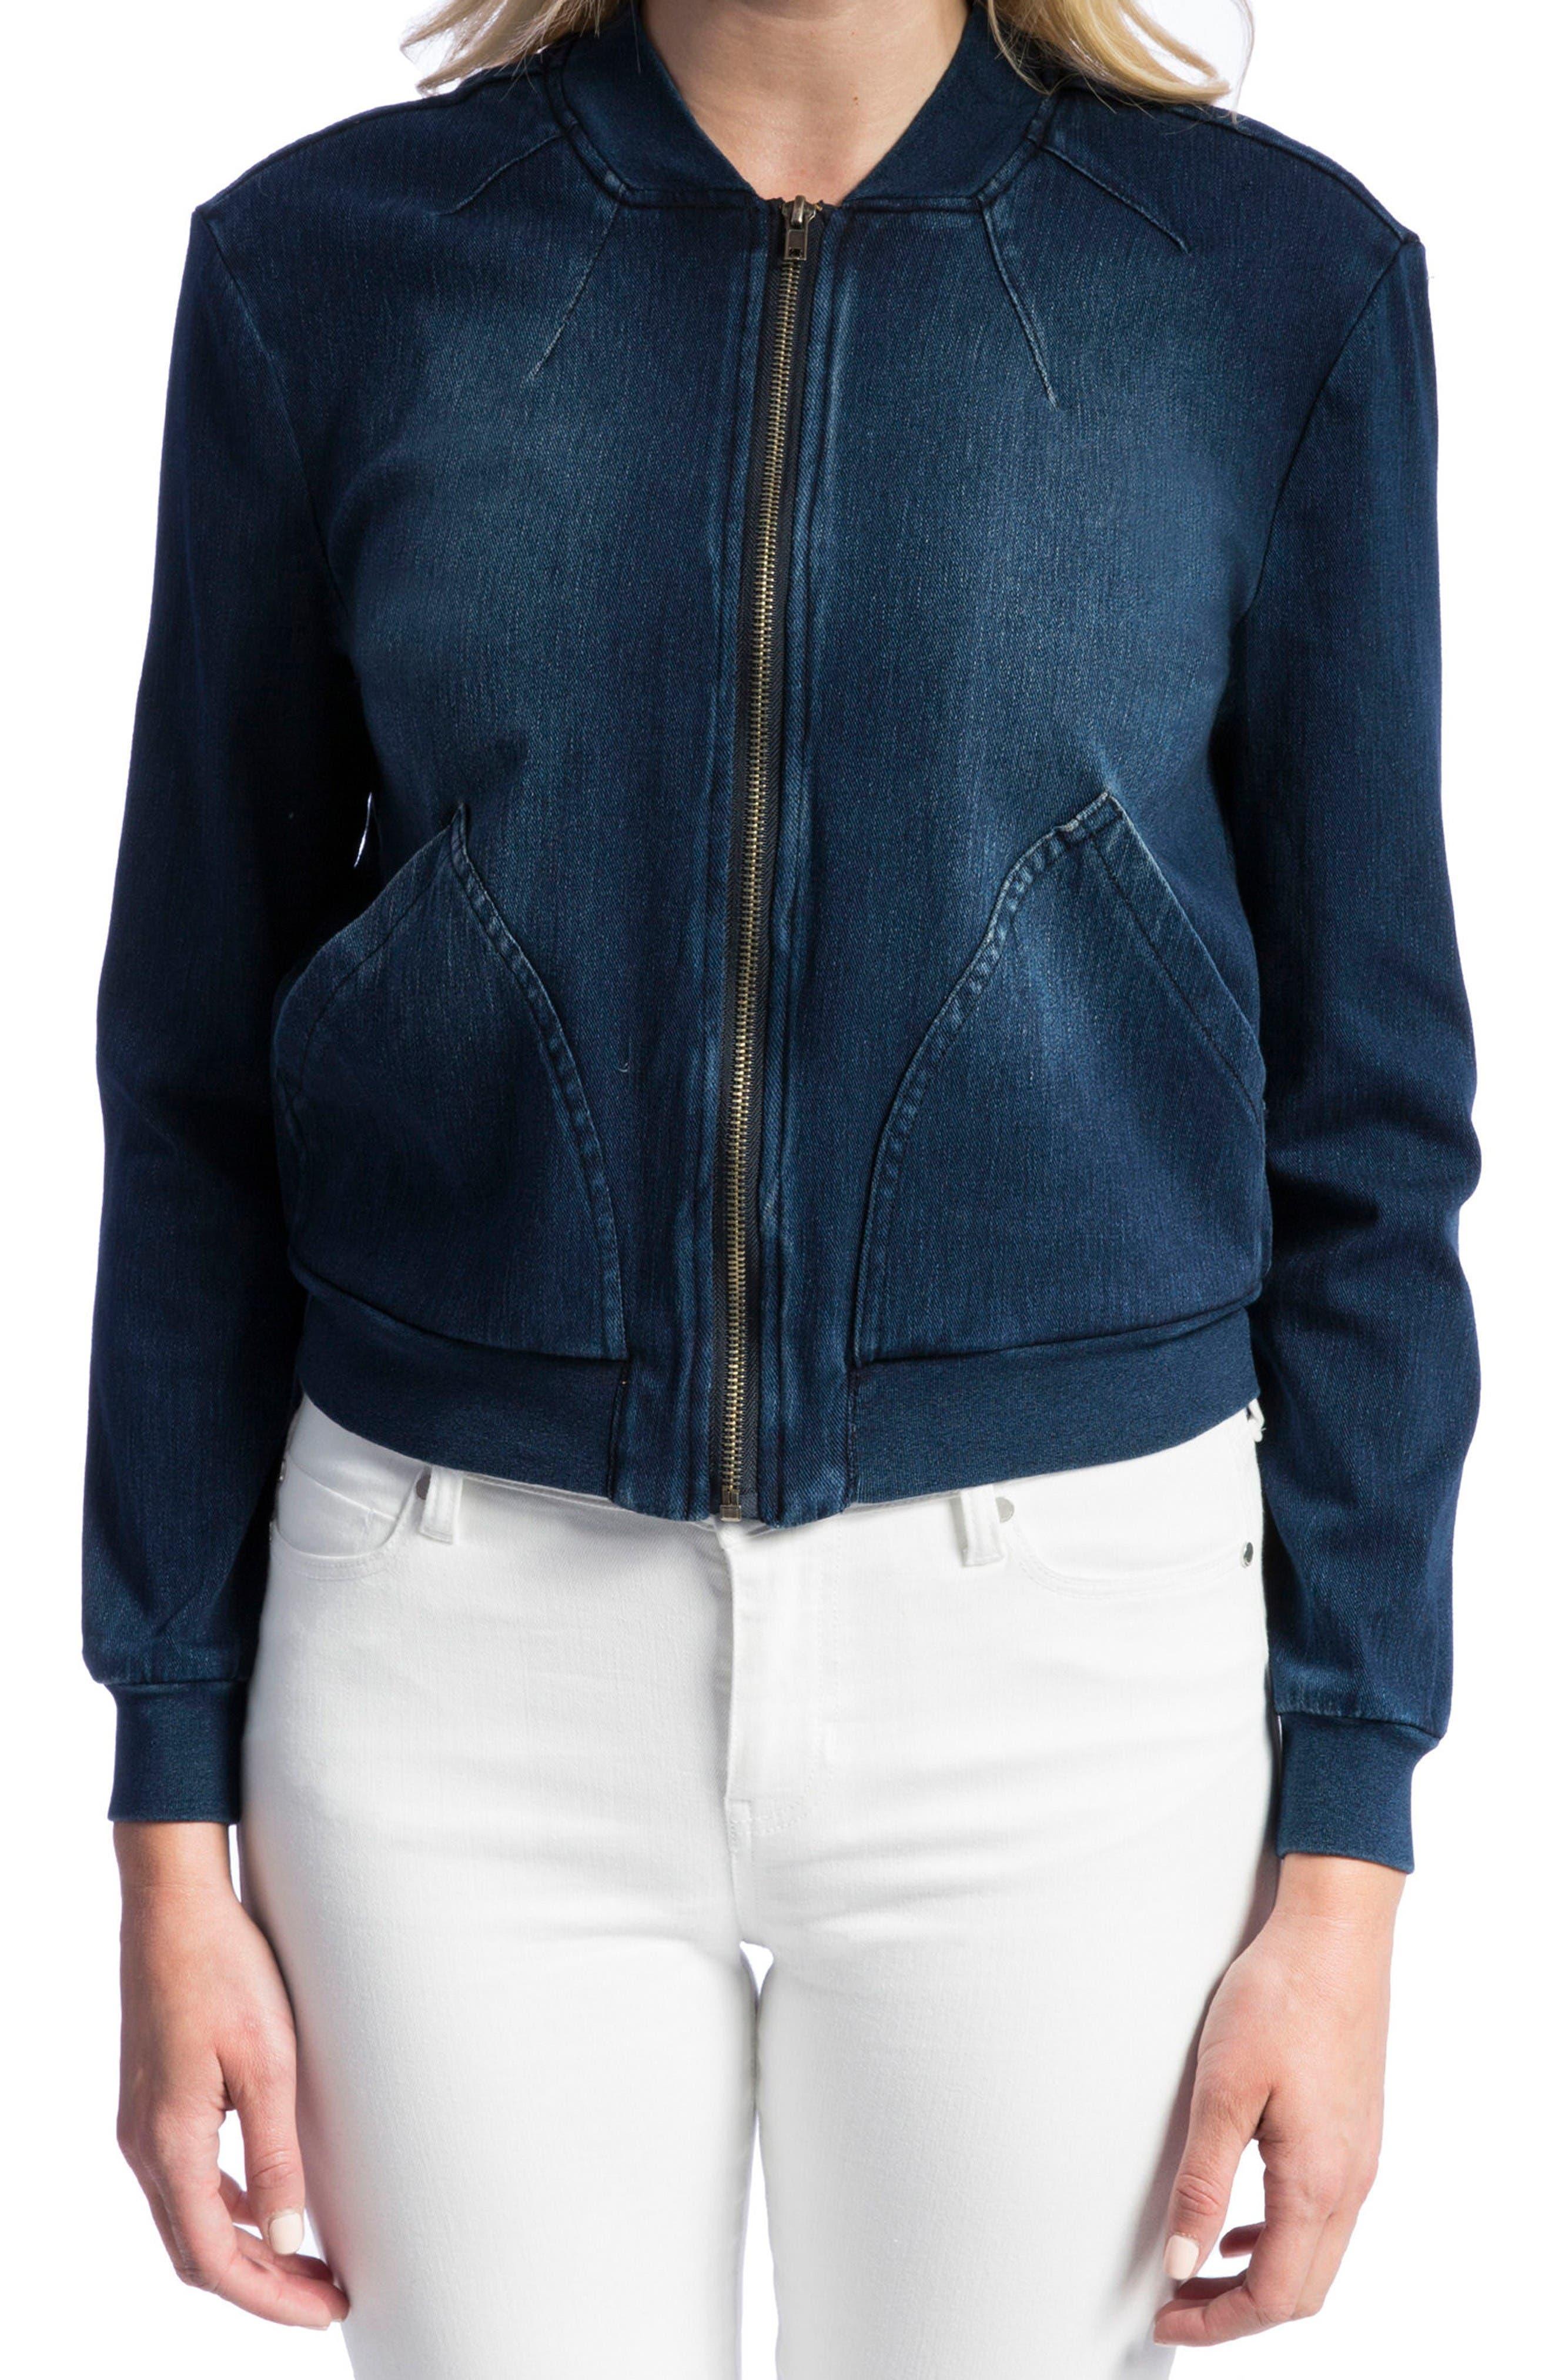 Main Image - Liverpool Jeans Company Denim Knit Bomber Jacket